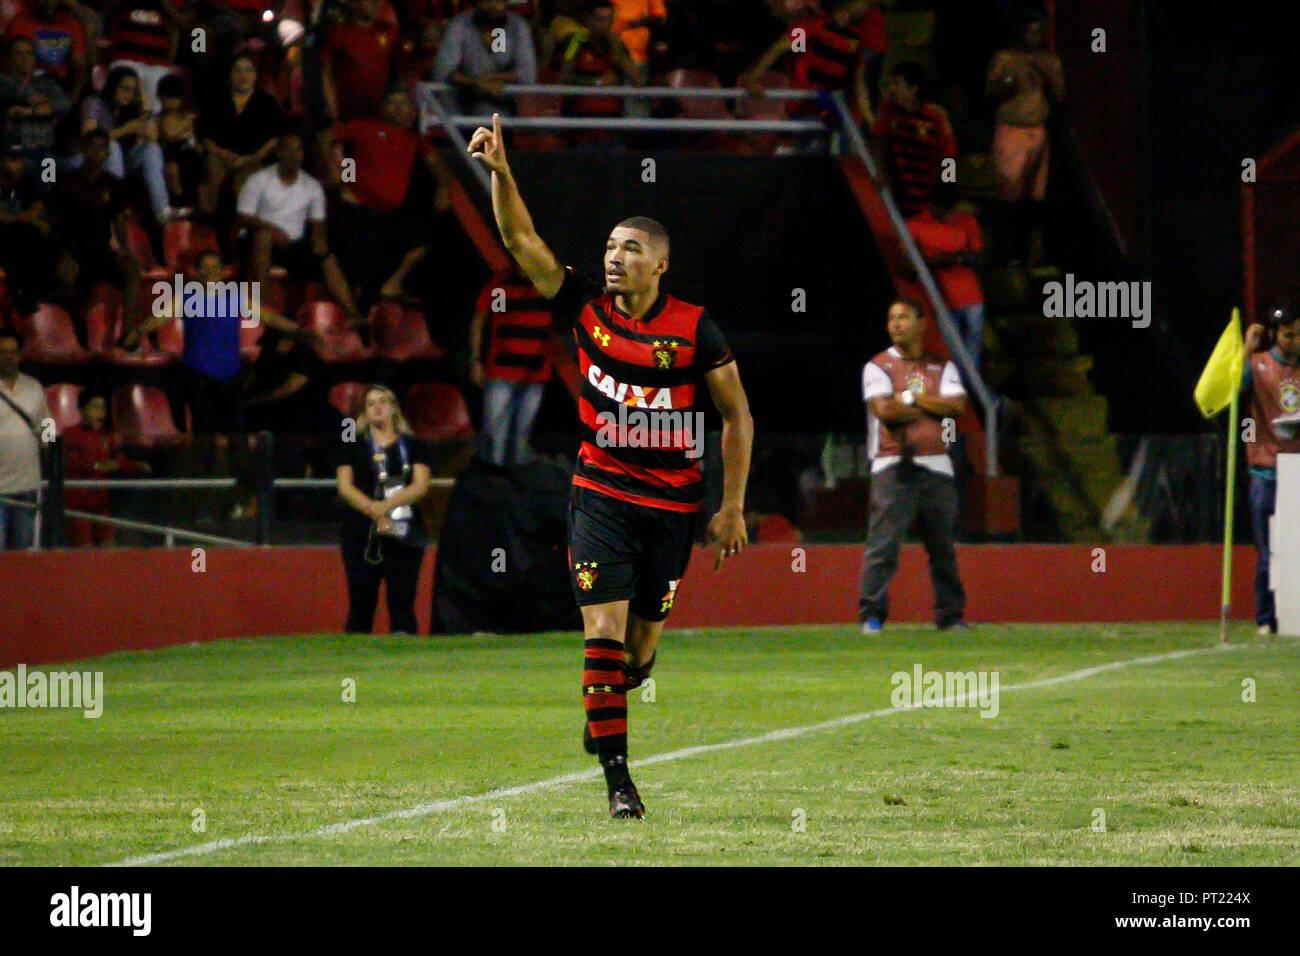 Recife Brazil 05th Oct 2018 Adryelson Sport Player Celebrating Goal During Sport X Internacional Held On